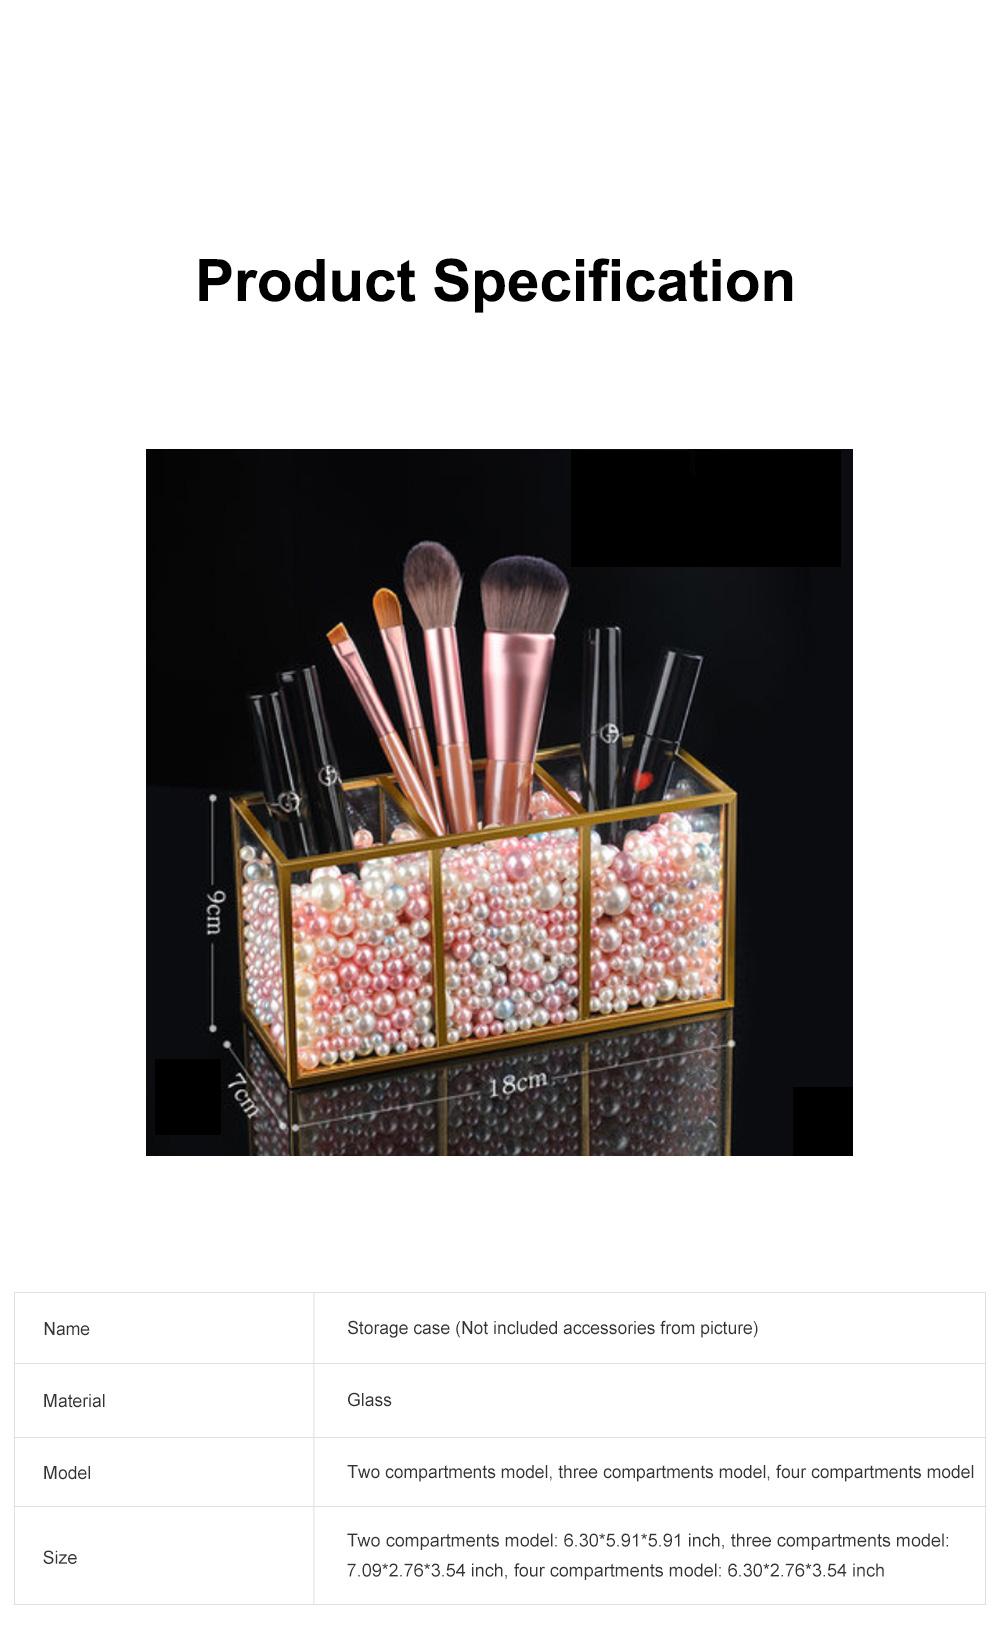 Stylish Minimalist Transparent Glass Desktop Storage Rack Jewelry Cosmetics Brushes Storage Case Box Household 6